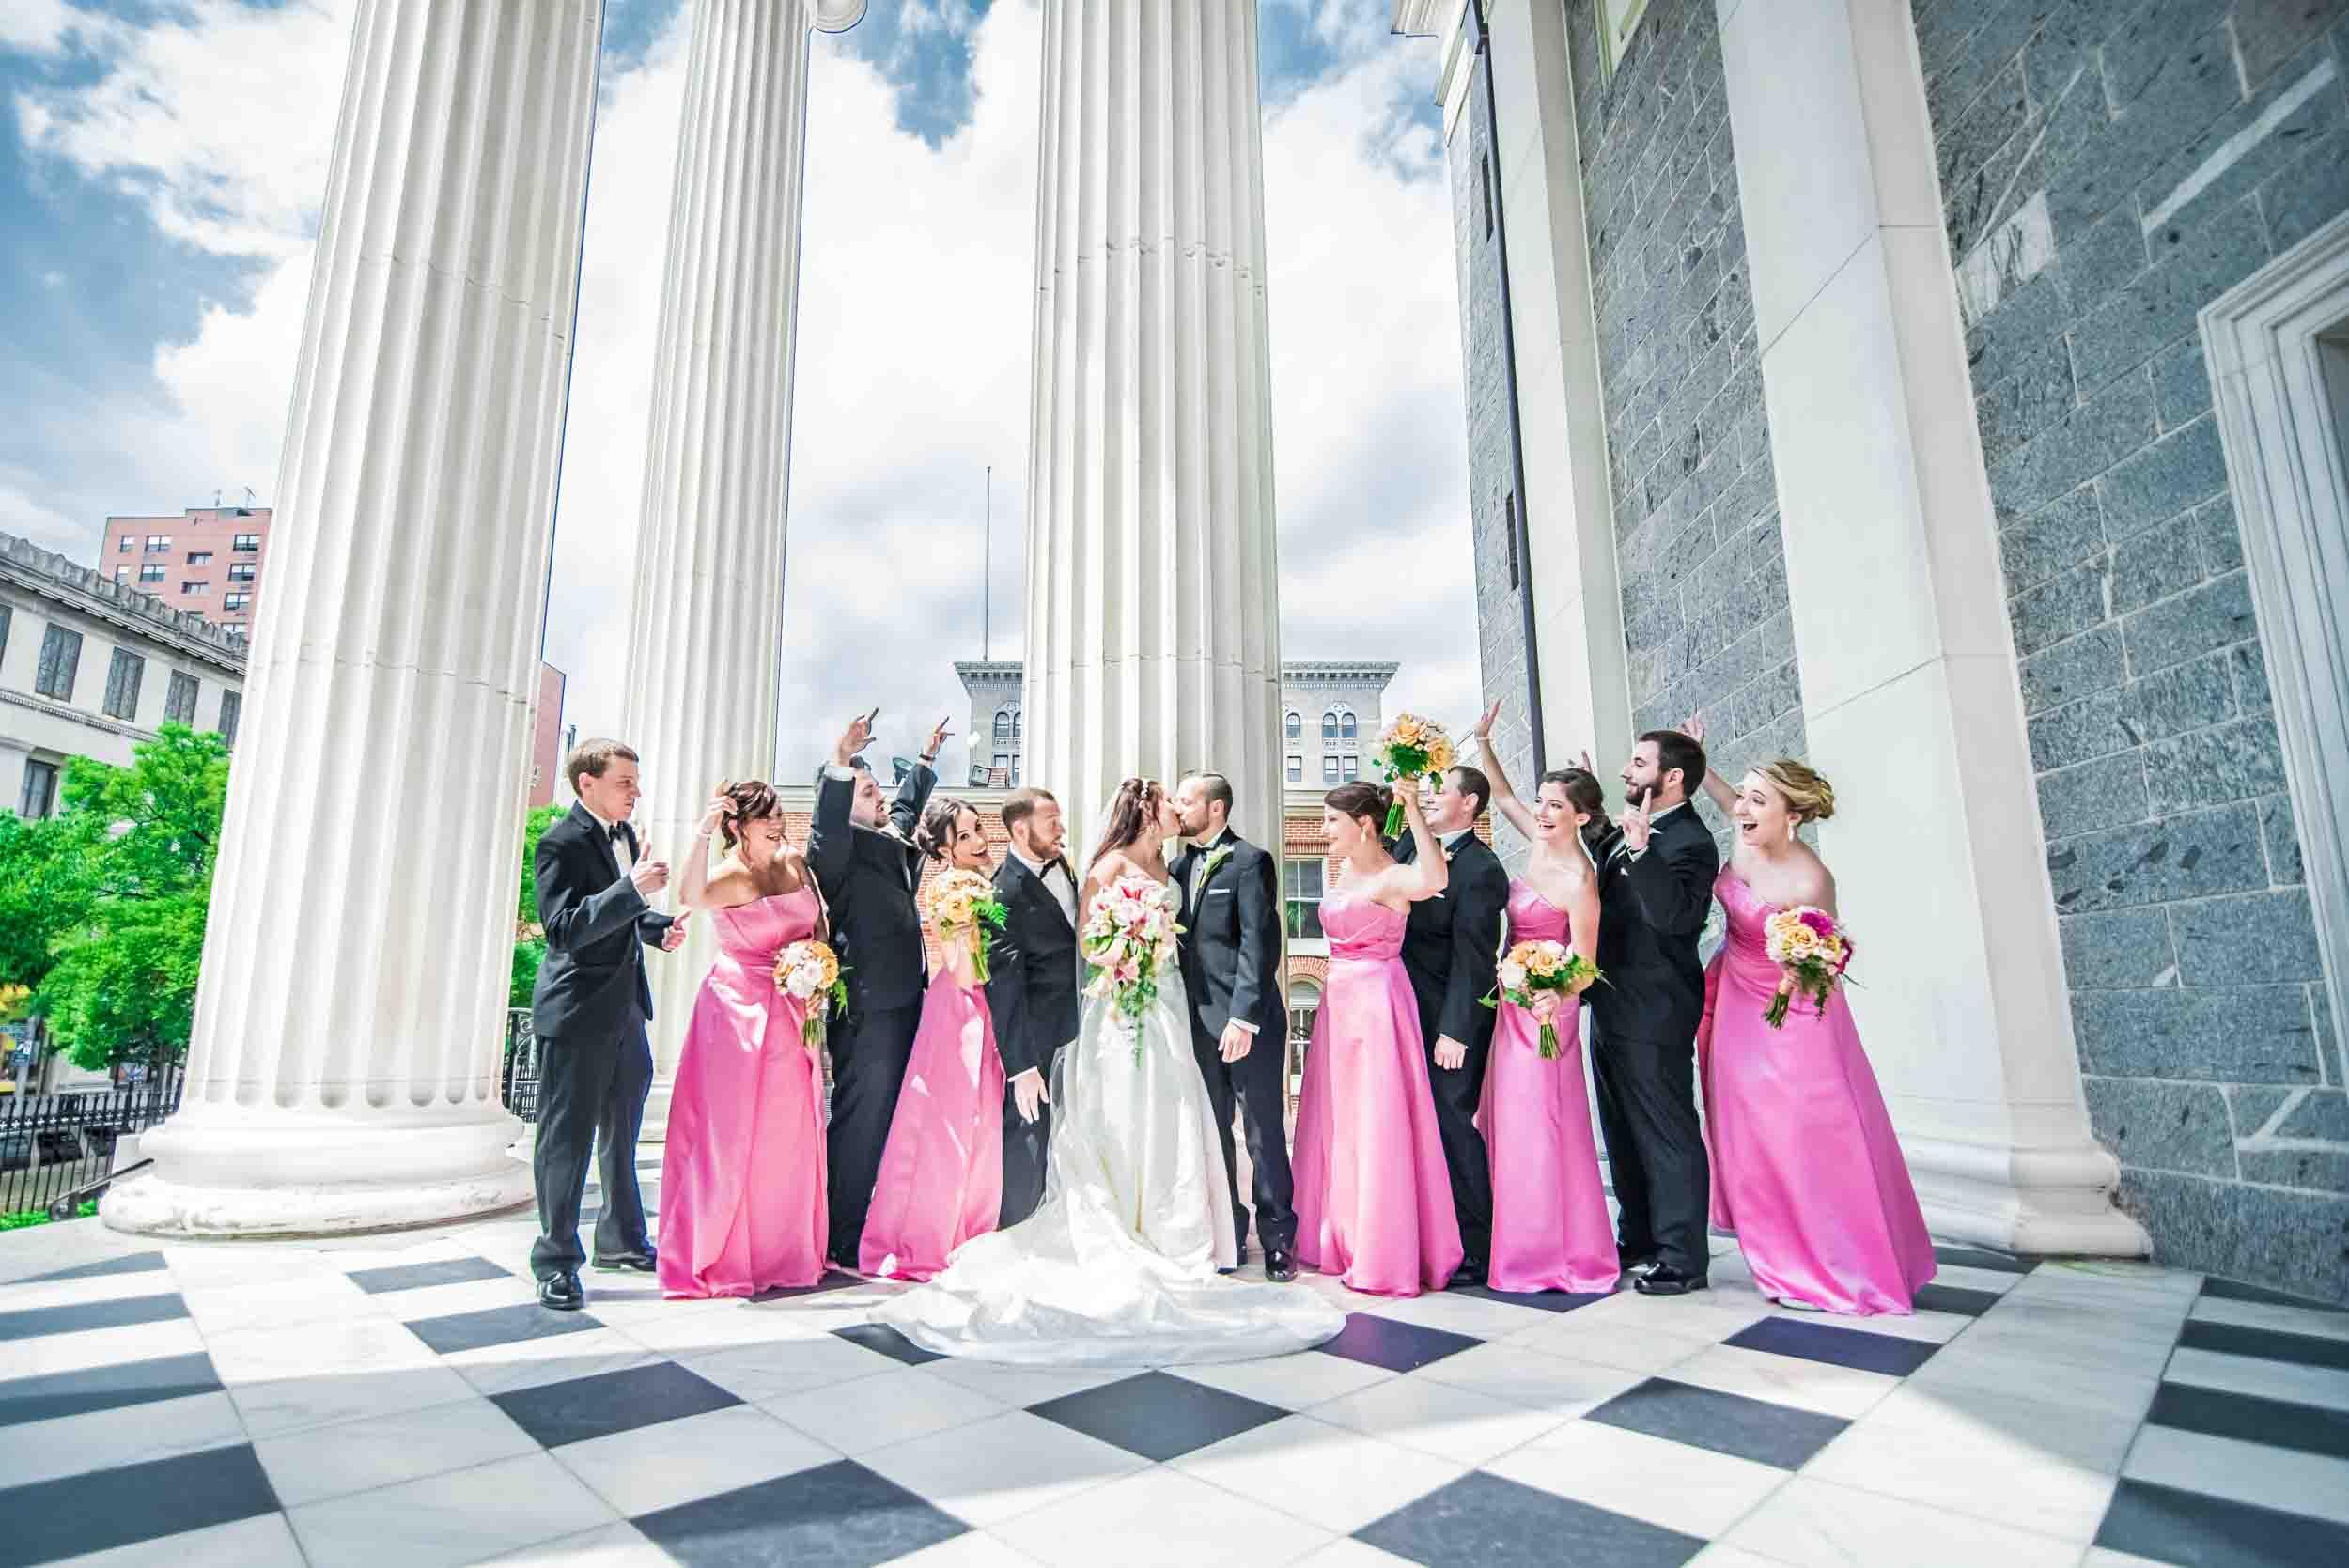 dc+metro+wedding+photographer+vadym+guliuk+photography+wedding+party-2020.jpg